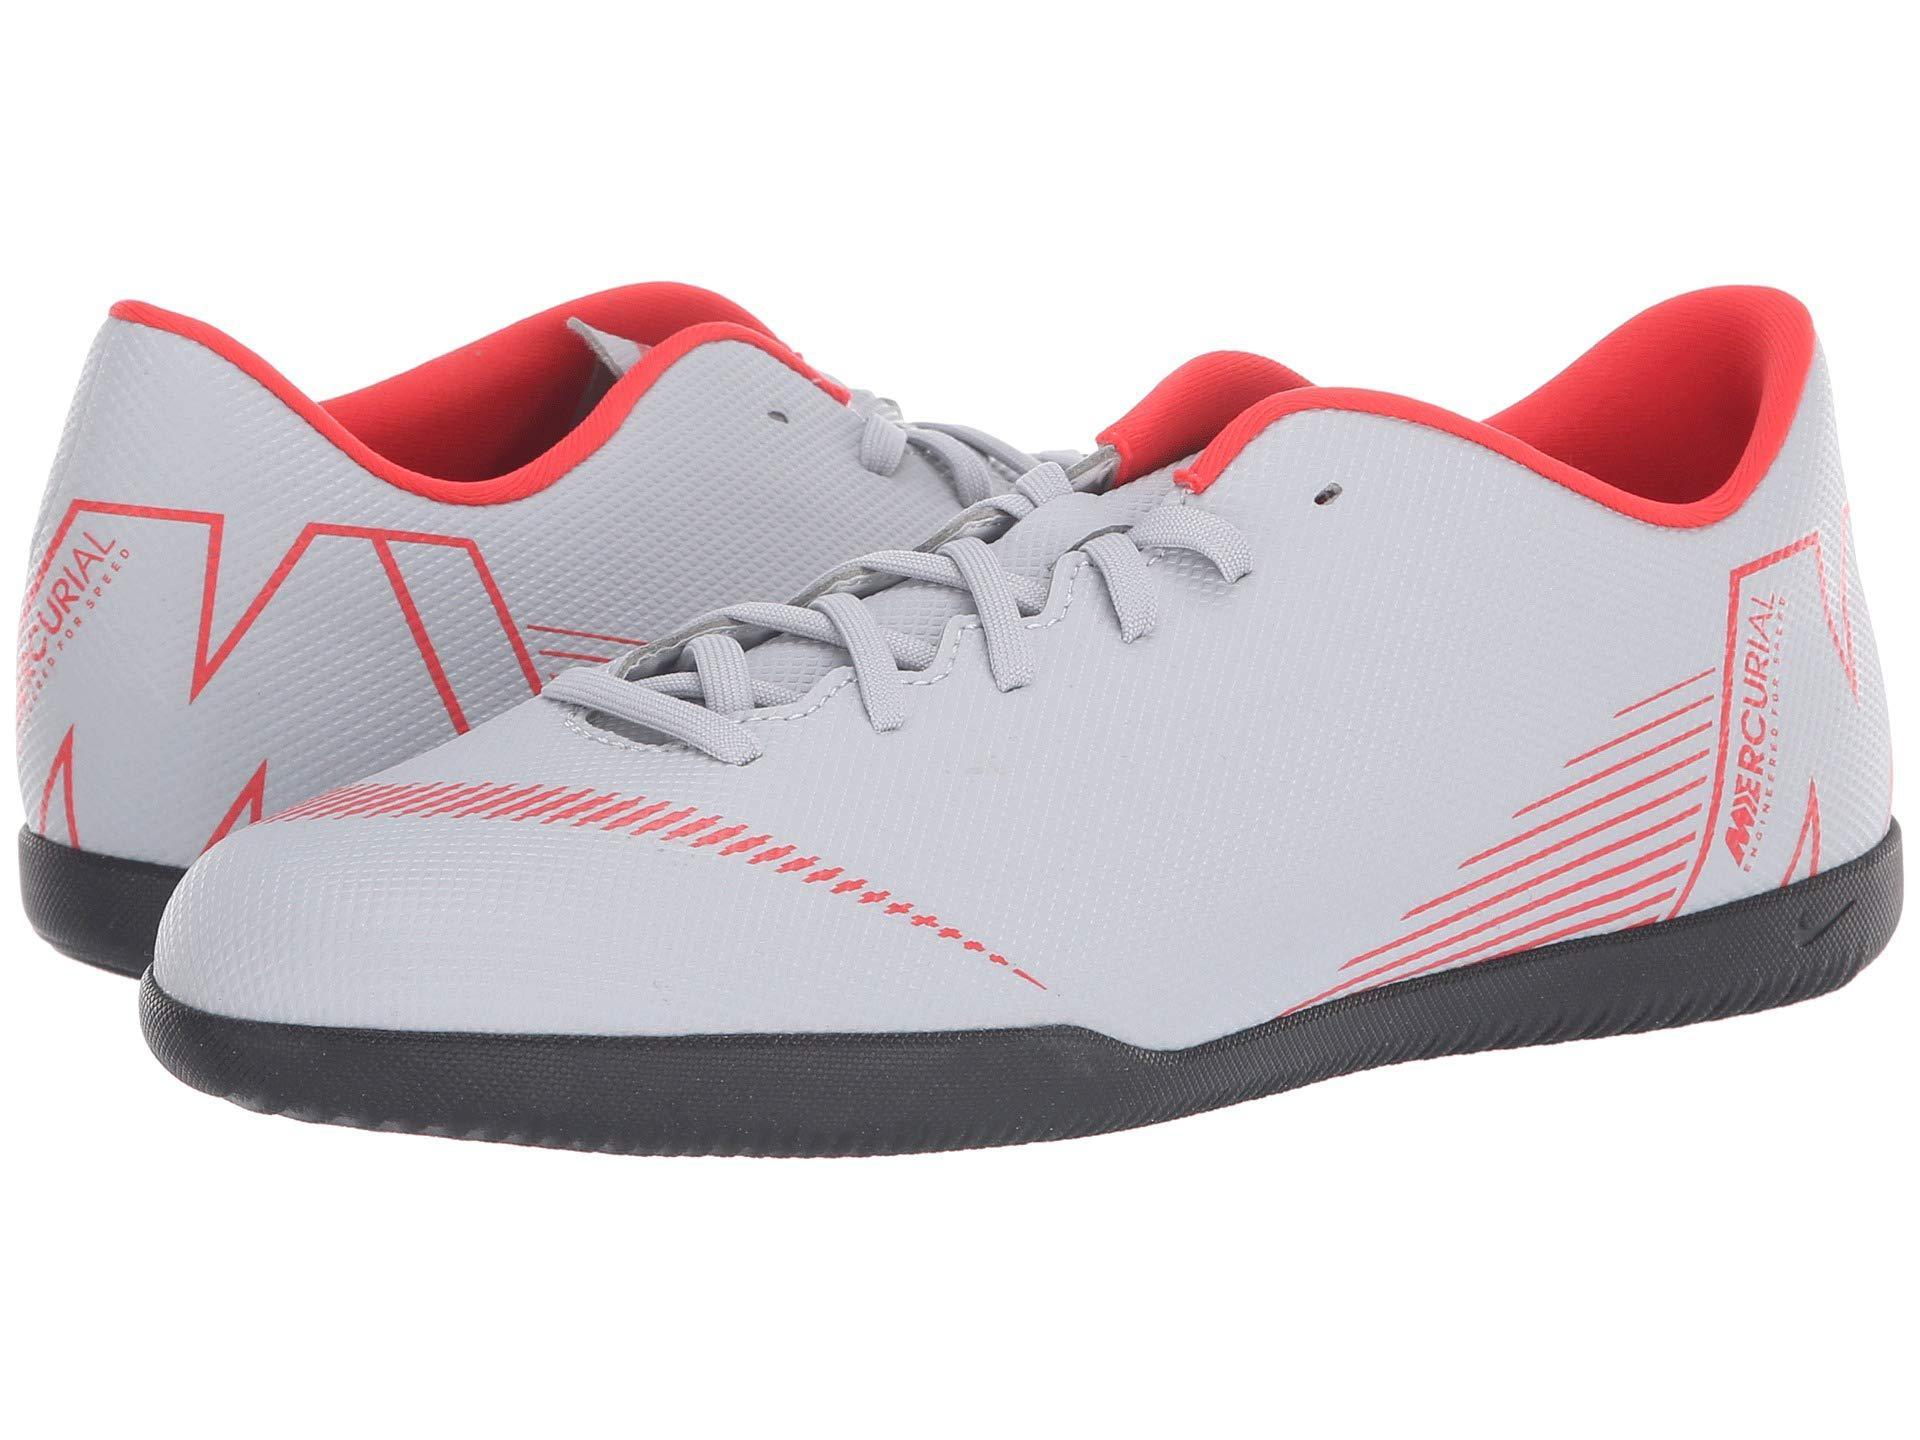 2dafaf94b Nike Vaporx 12 Club Ic in Gray for Men - Lyst